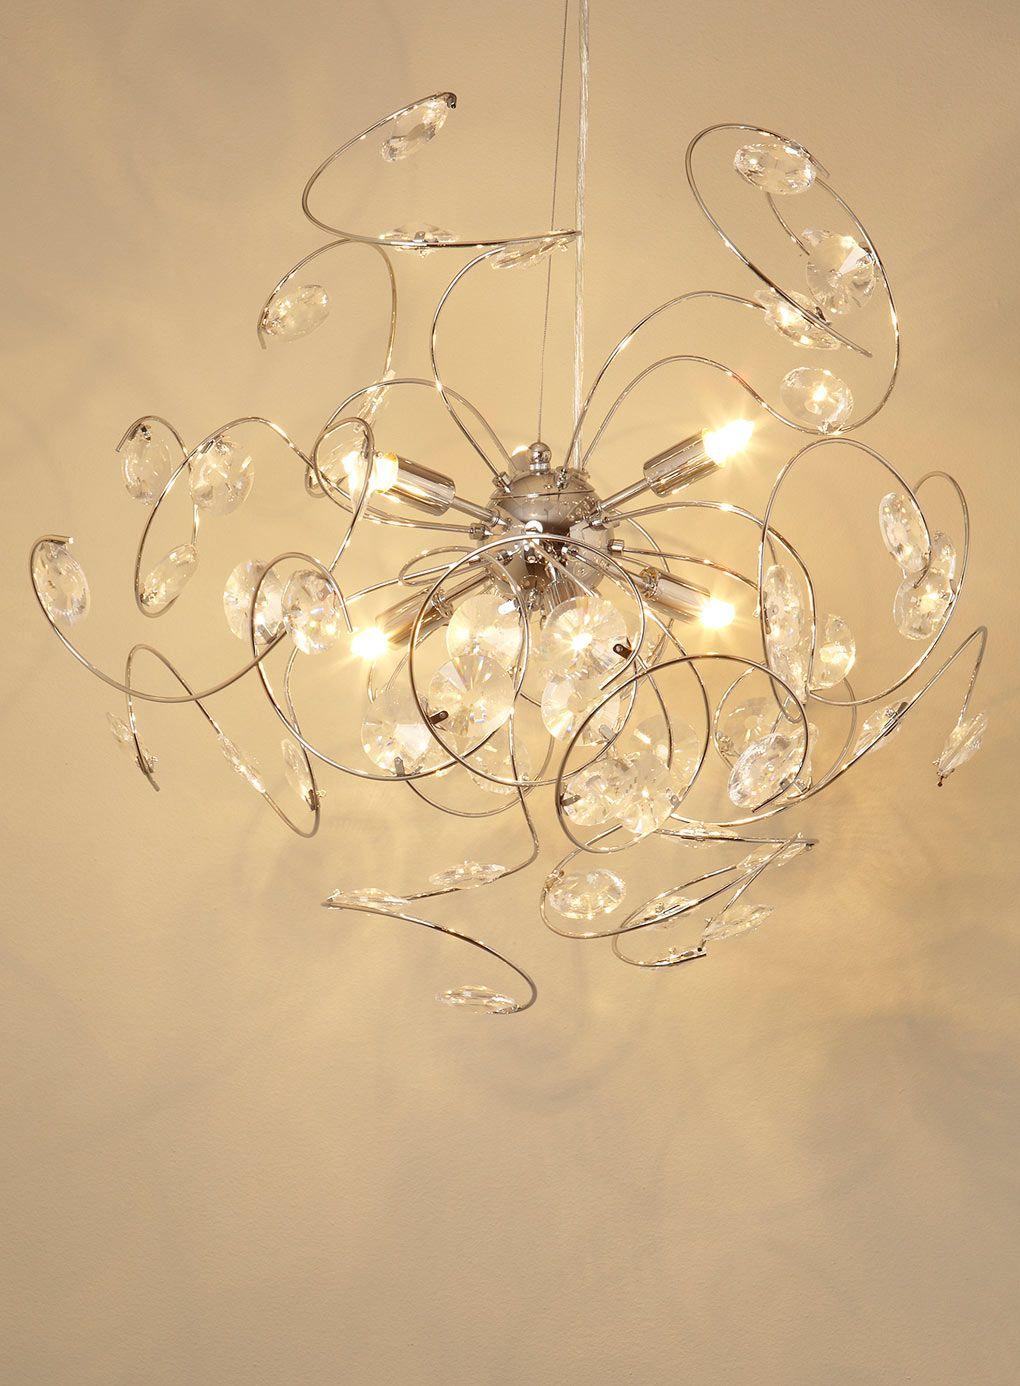 Bhs Ceiling Lights: Lila Sputnik Ceiling Light - - Sale (Hidden) - BHS,Lighting